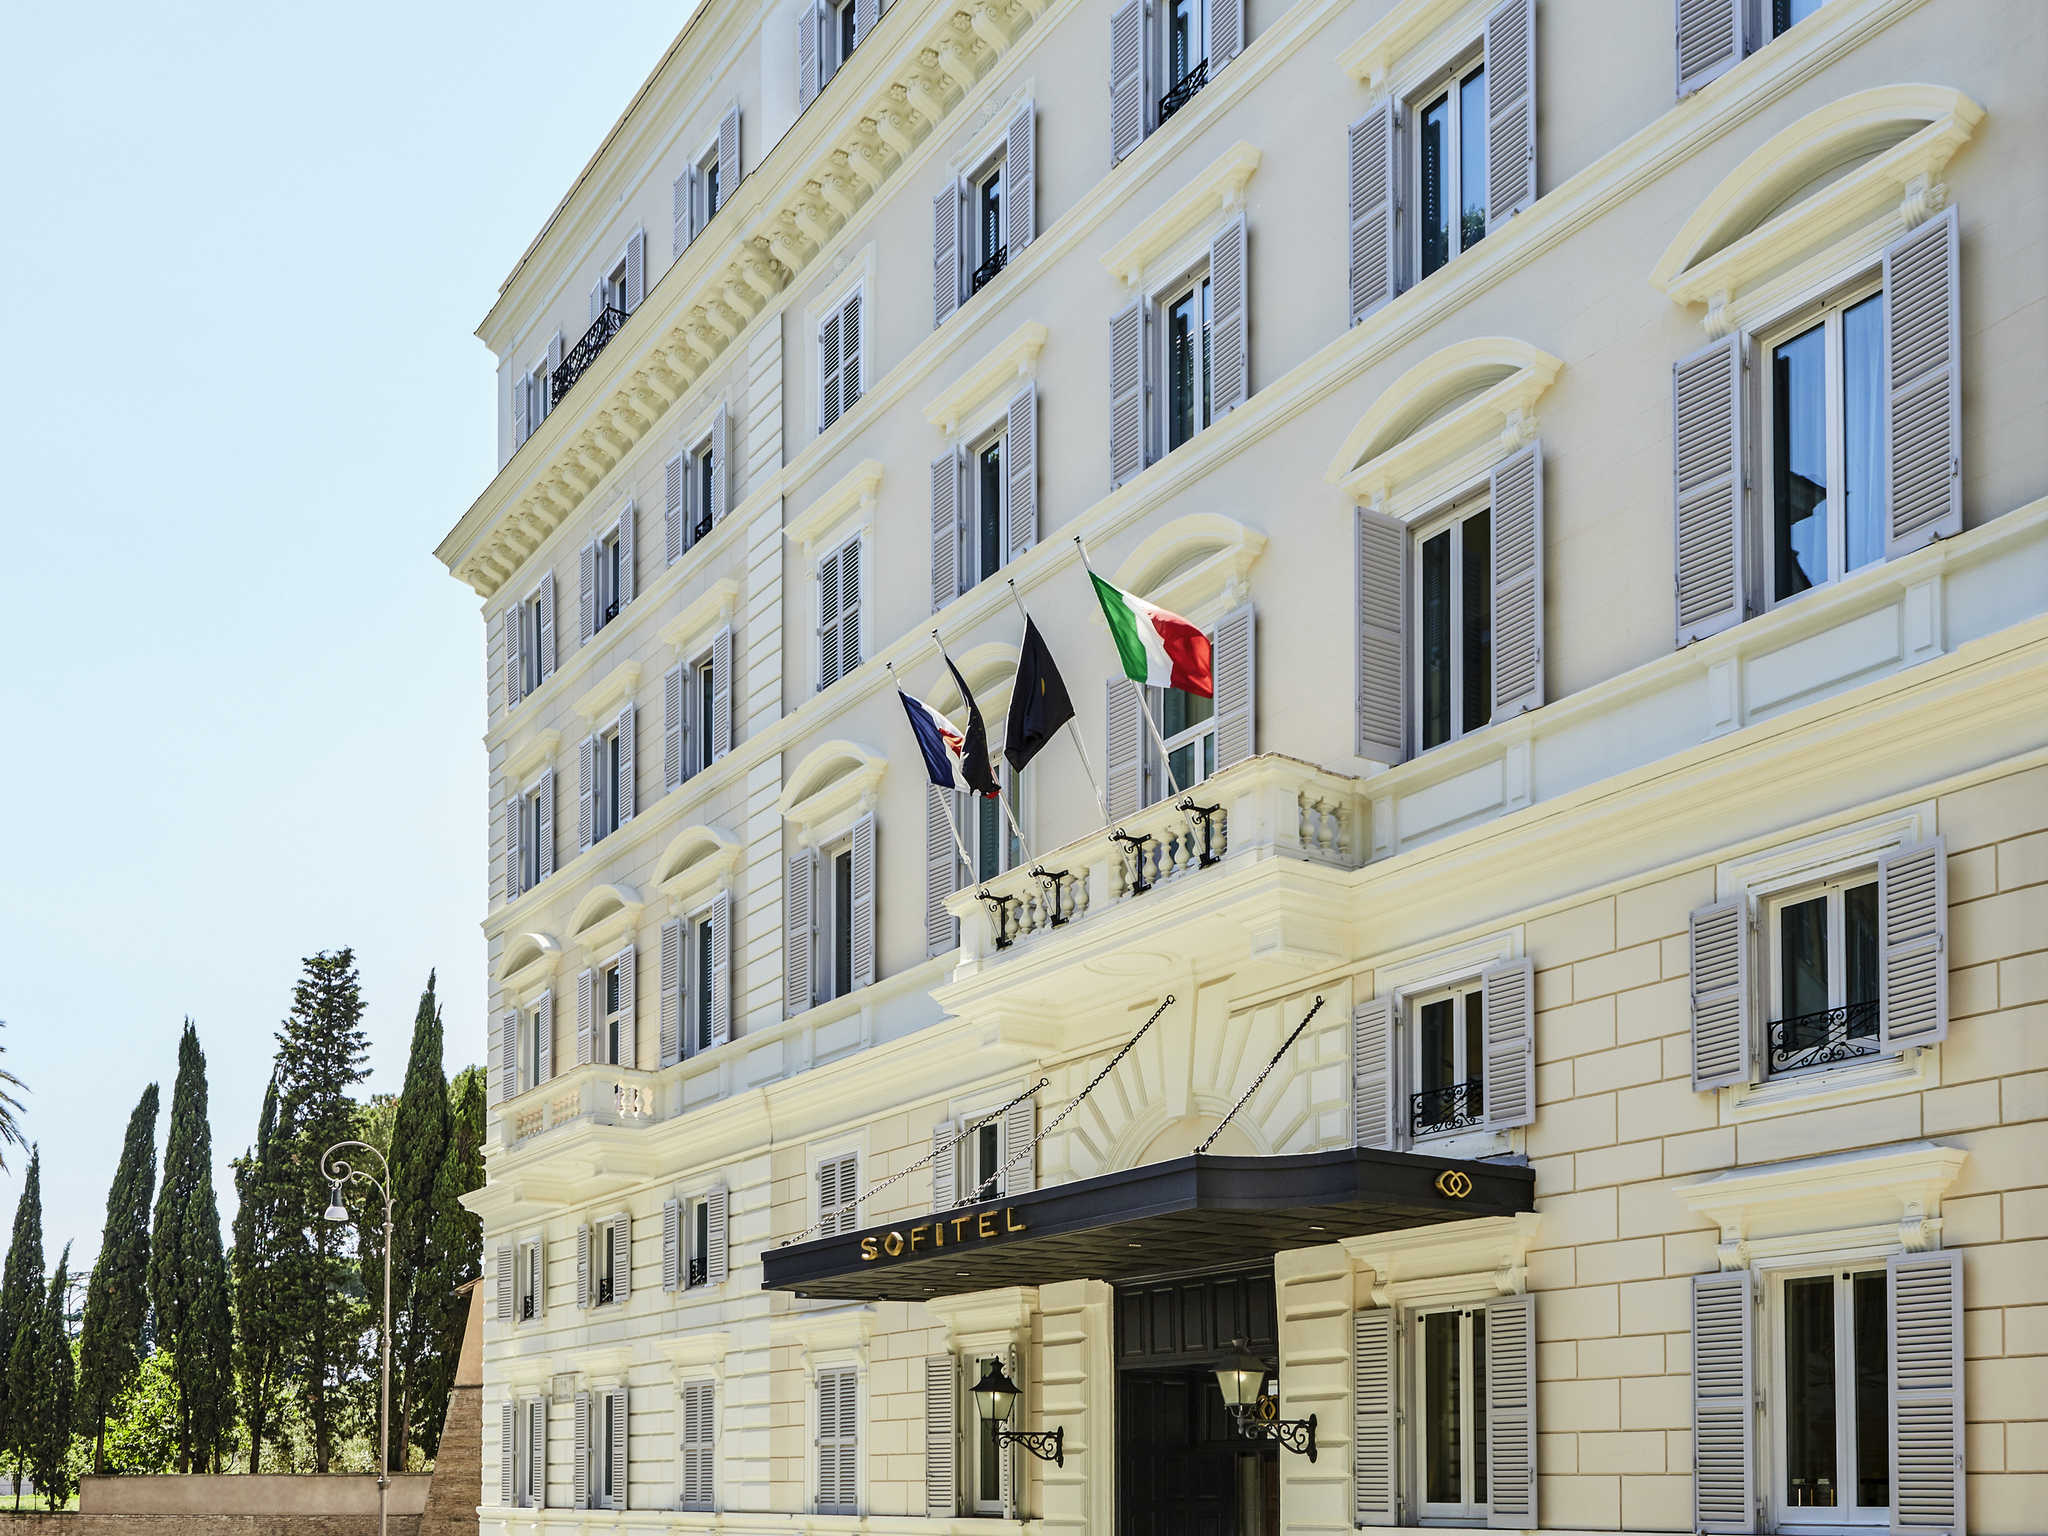 فندق - يخضع Sofitel Rome لعمليات تجديد شاملة، يعاد افتتاحه في آذار 2019